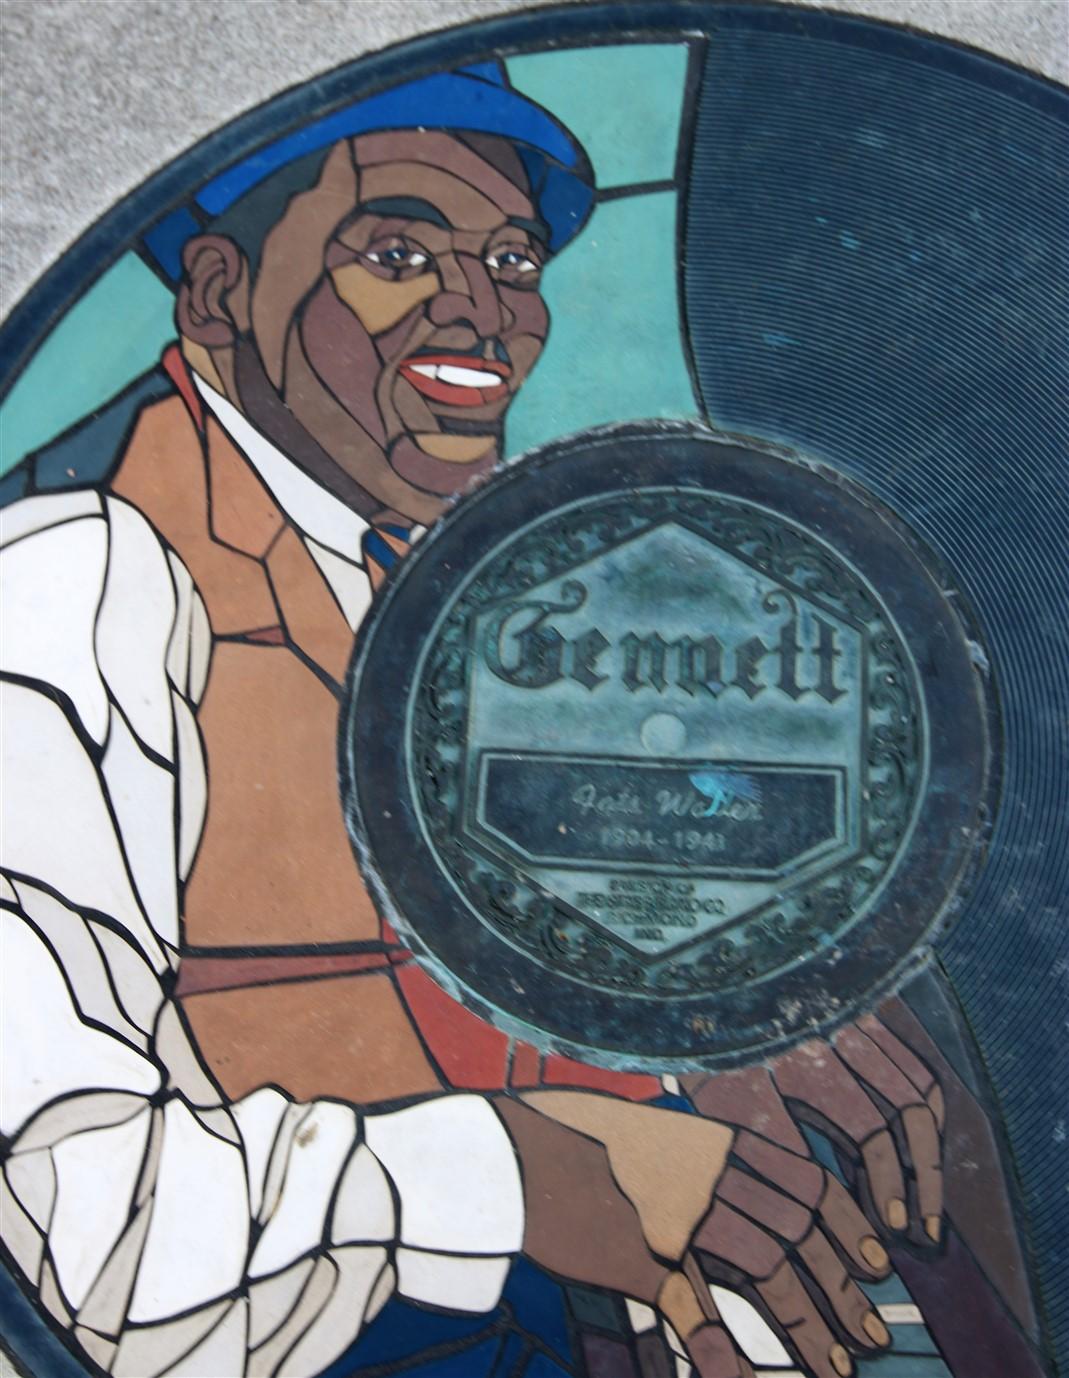 2018 07 17 434  Richmond IN Gennett Records Walk of Fame.jpg